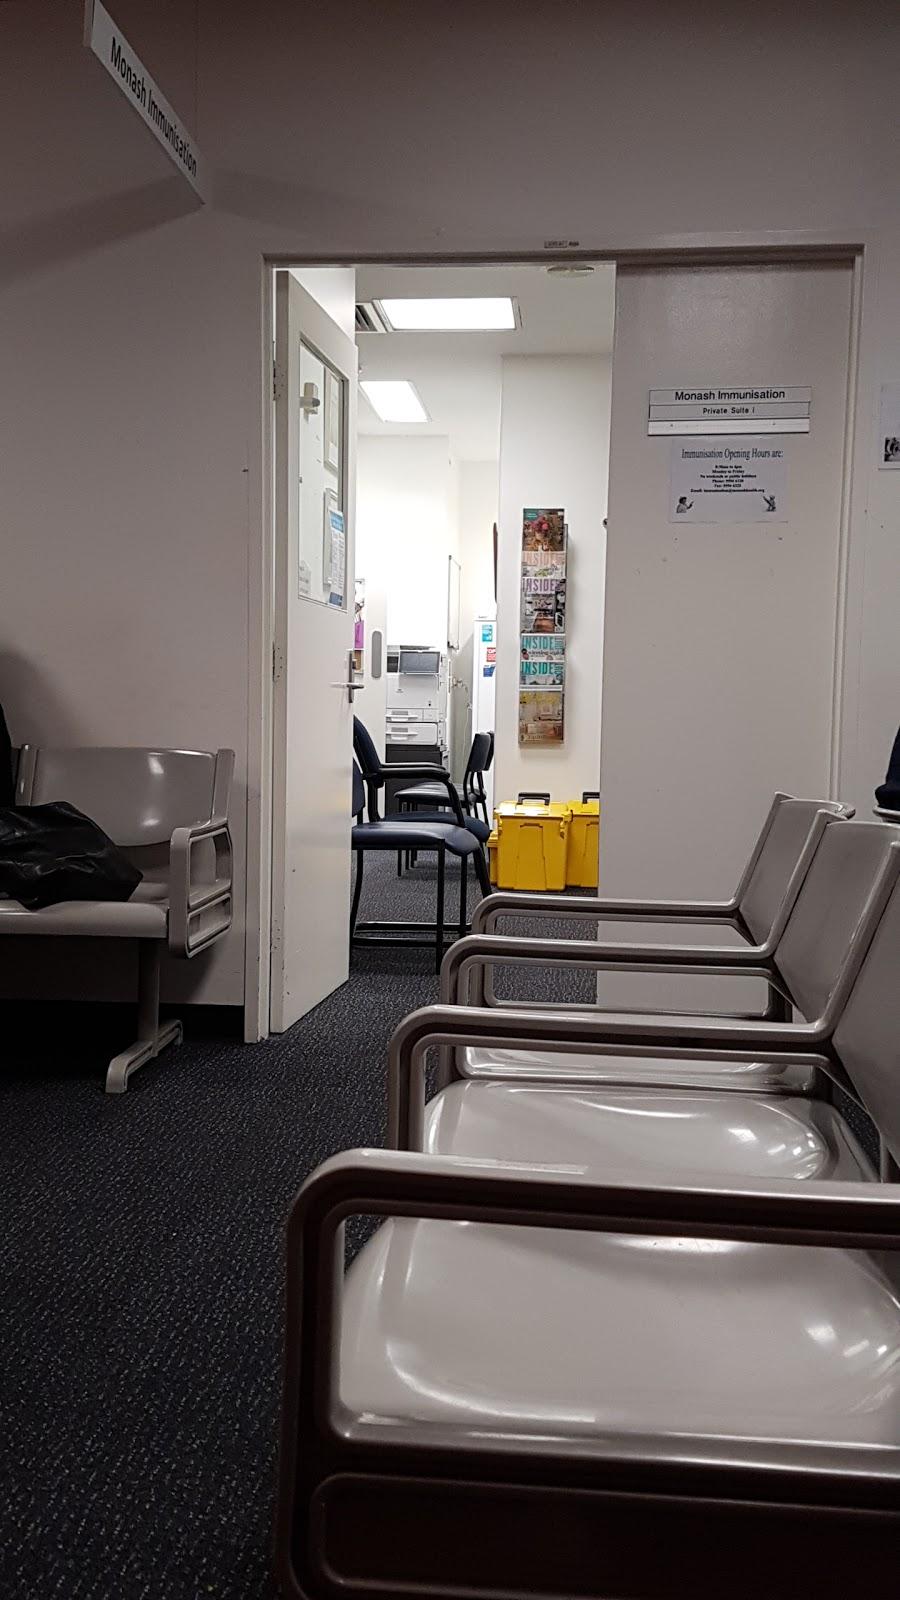 Monash Immunisation | hospital | Clayton VIC 3168, Australia